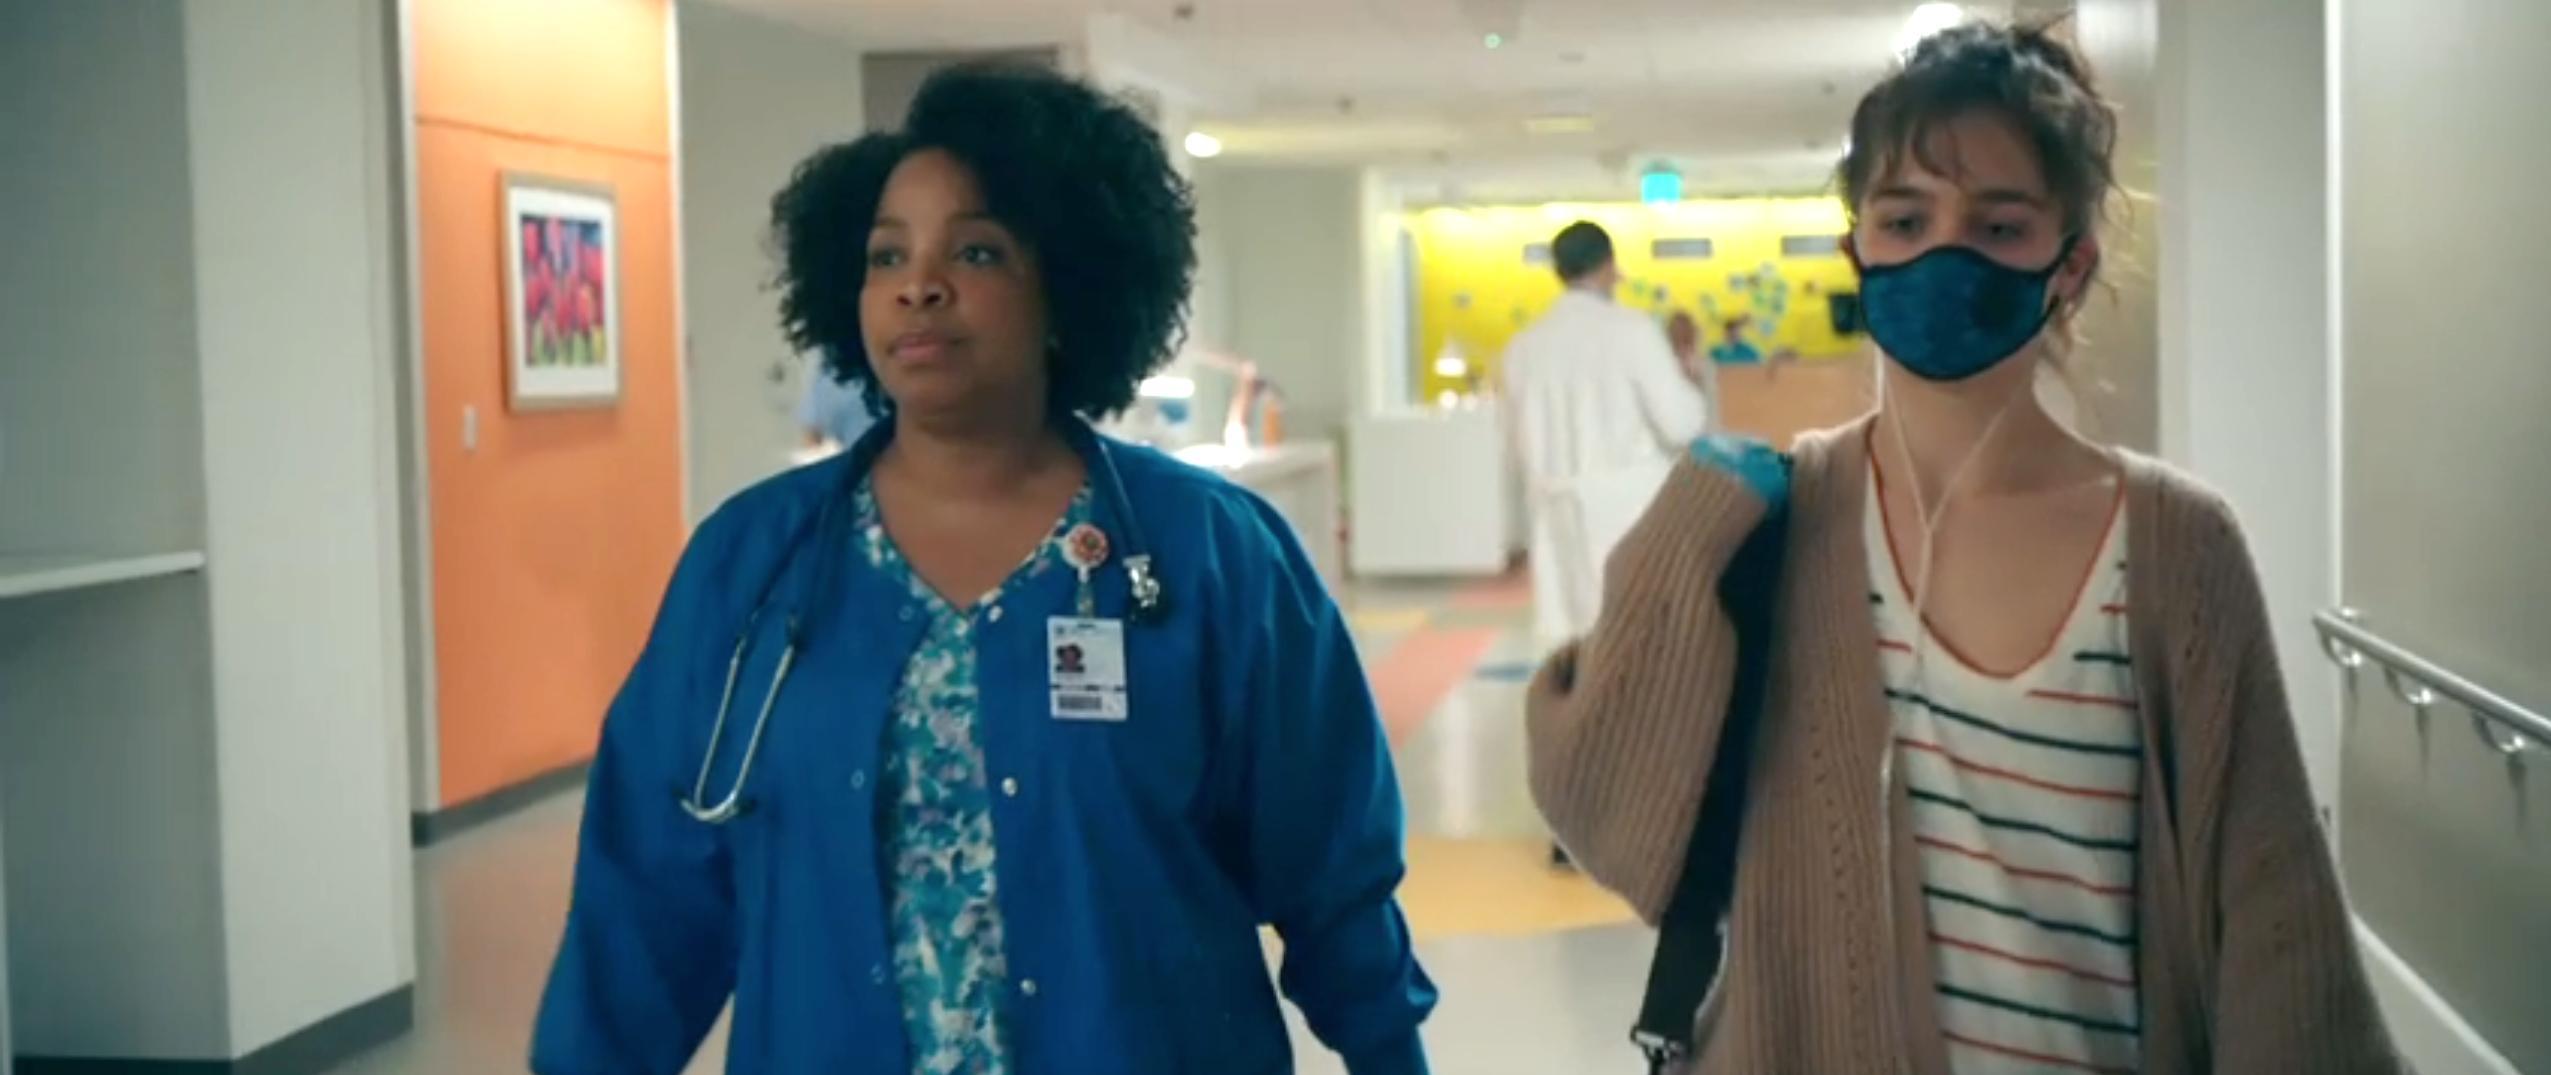 Kimberly Hebert Gregory and Haley Lu Richardson in Five Feet Apart (2019)